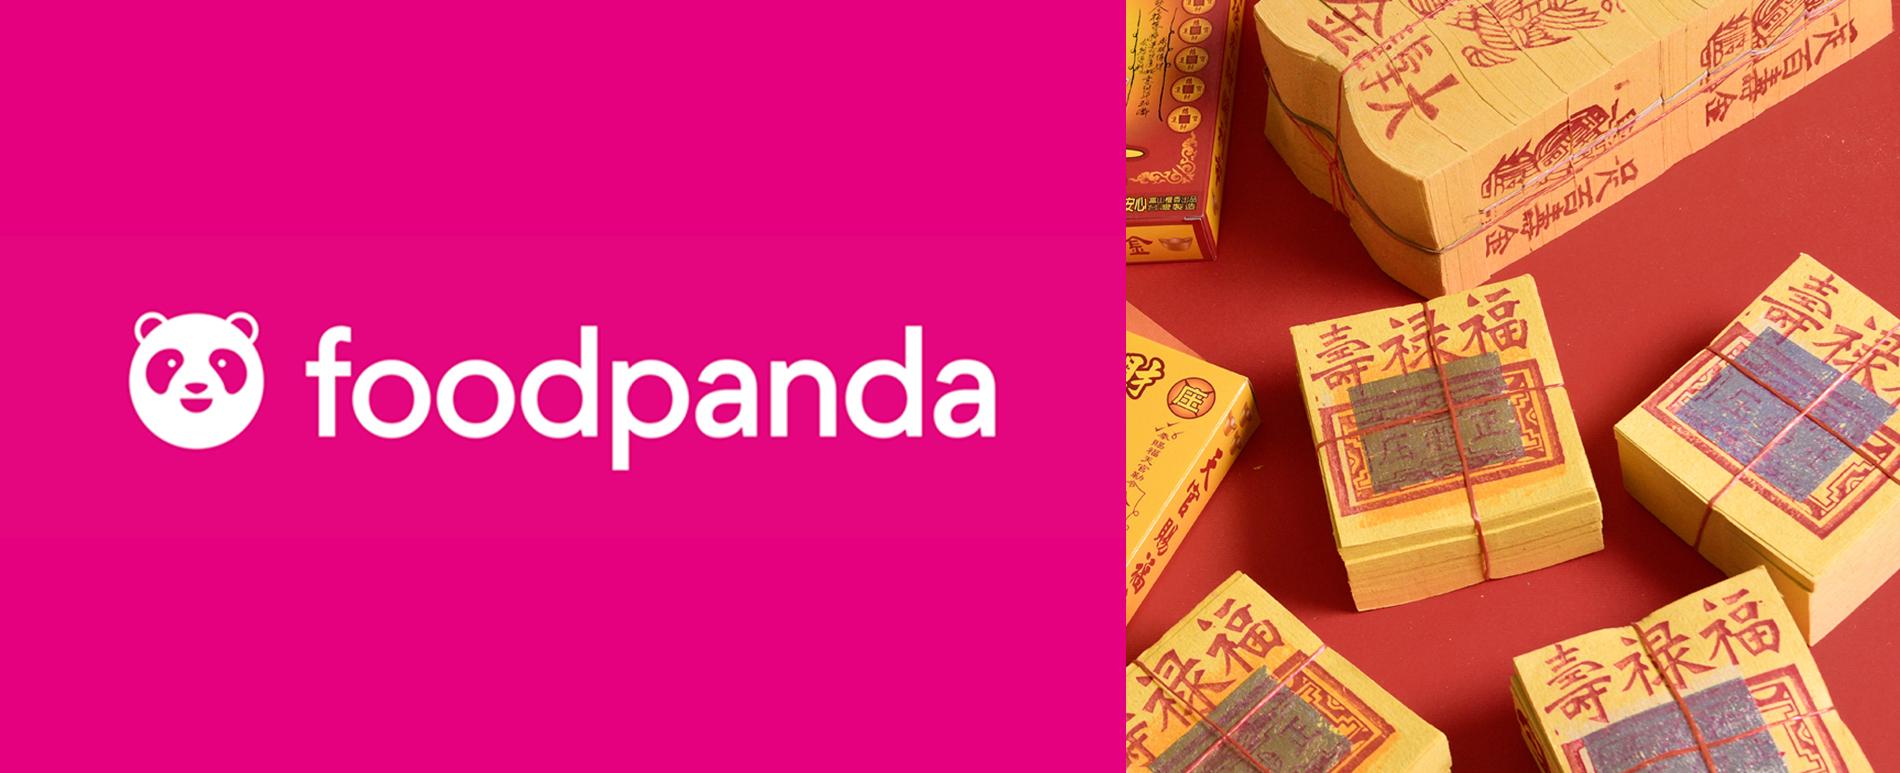 品牌故事2-foodpada (1)